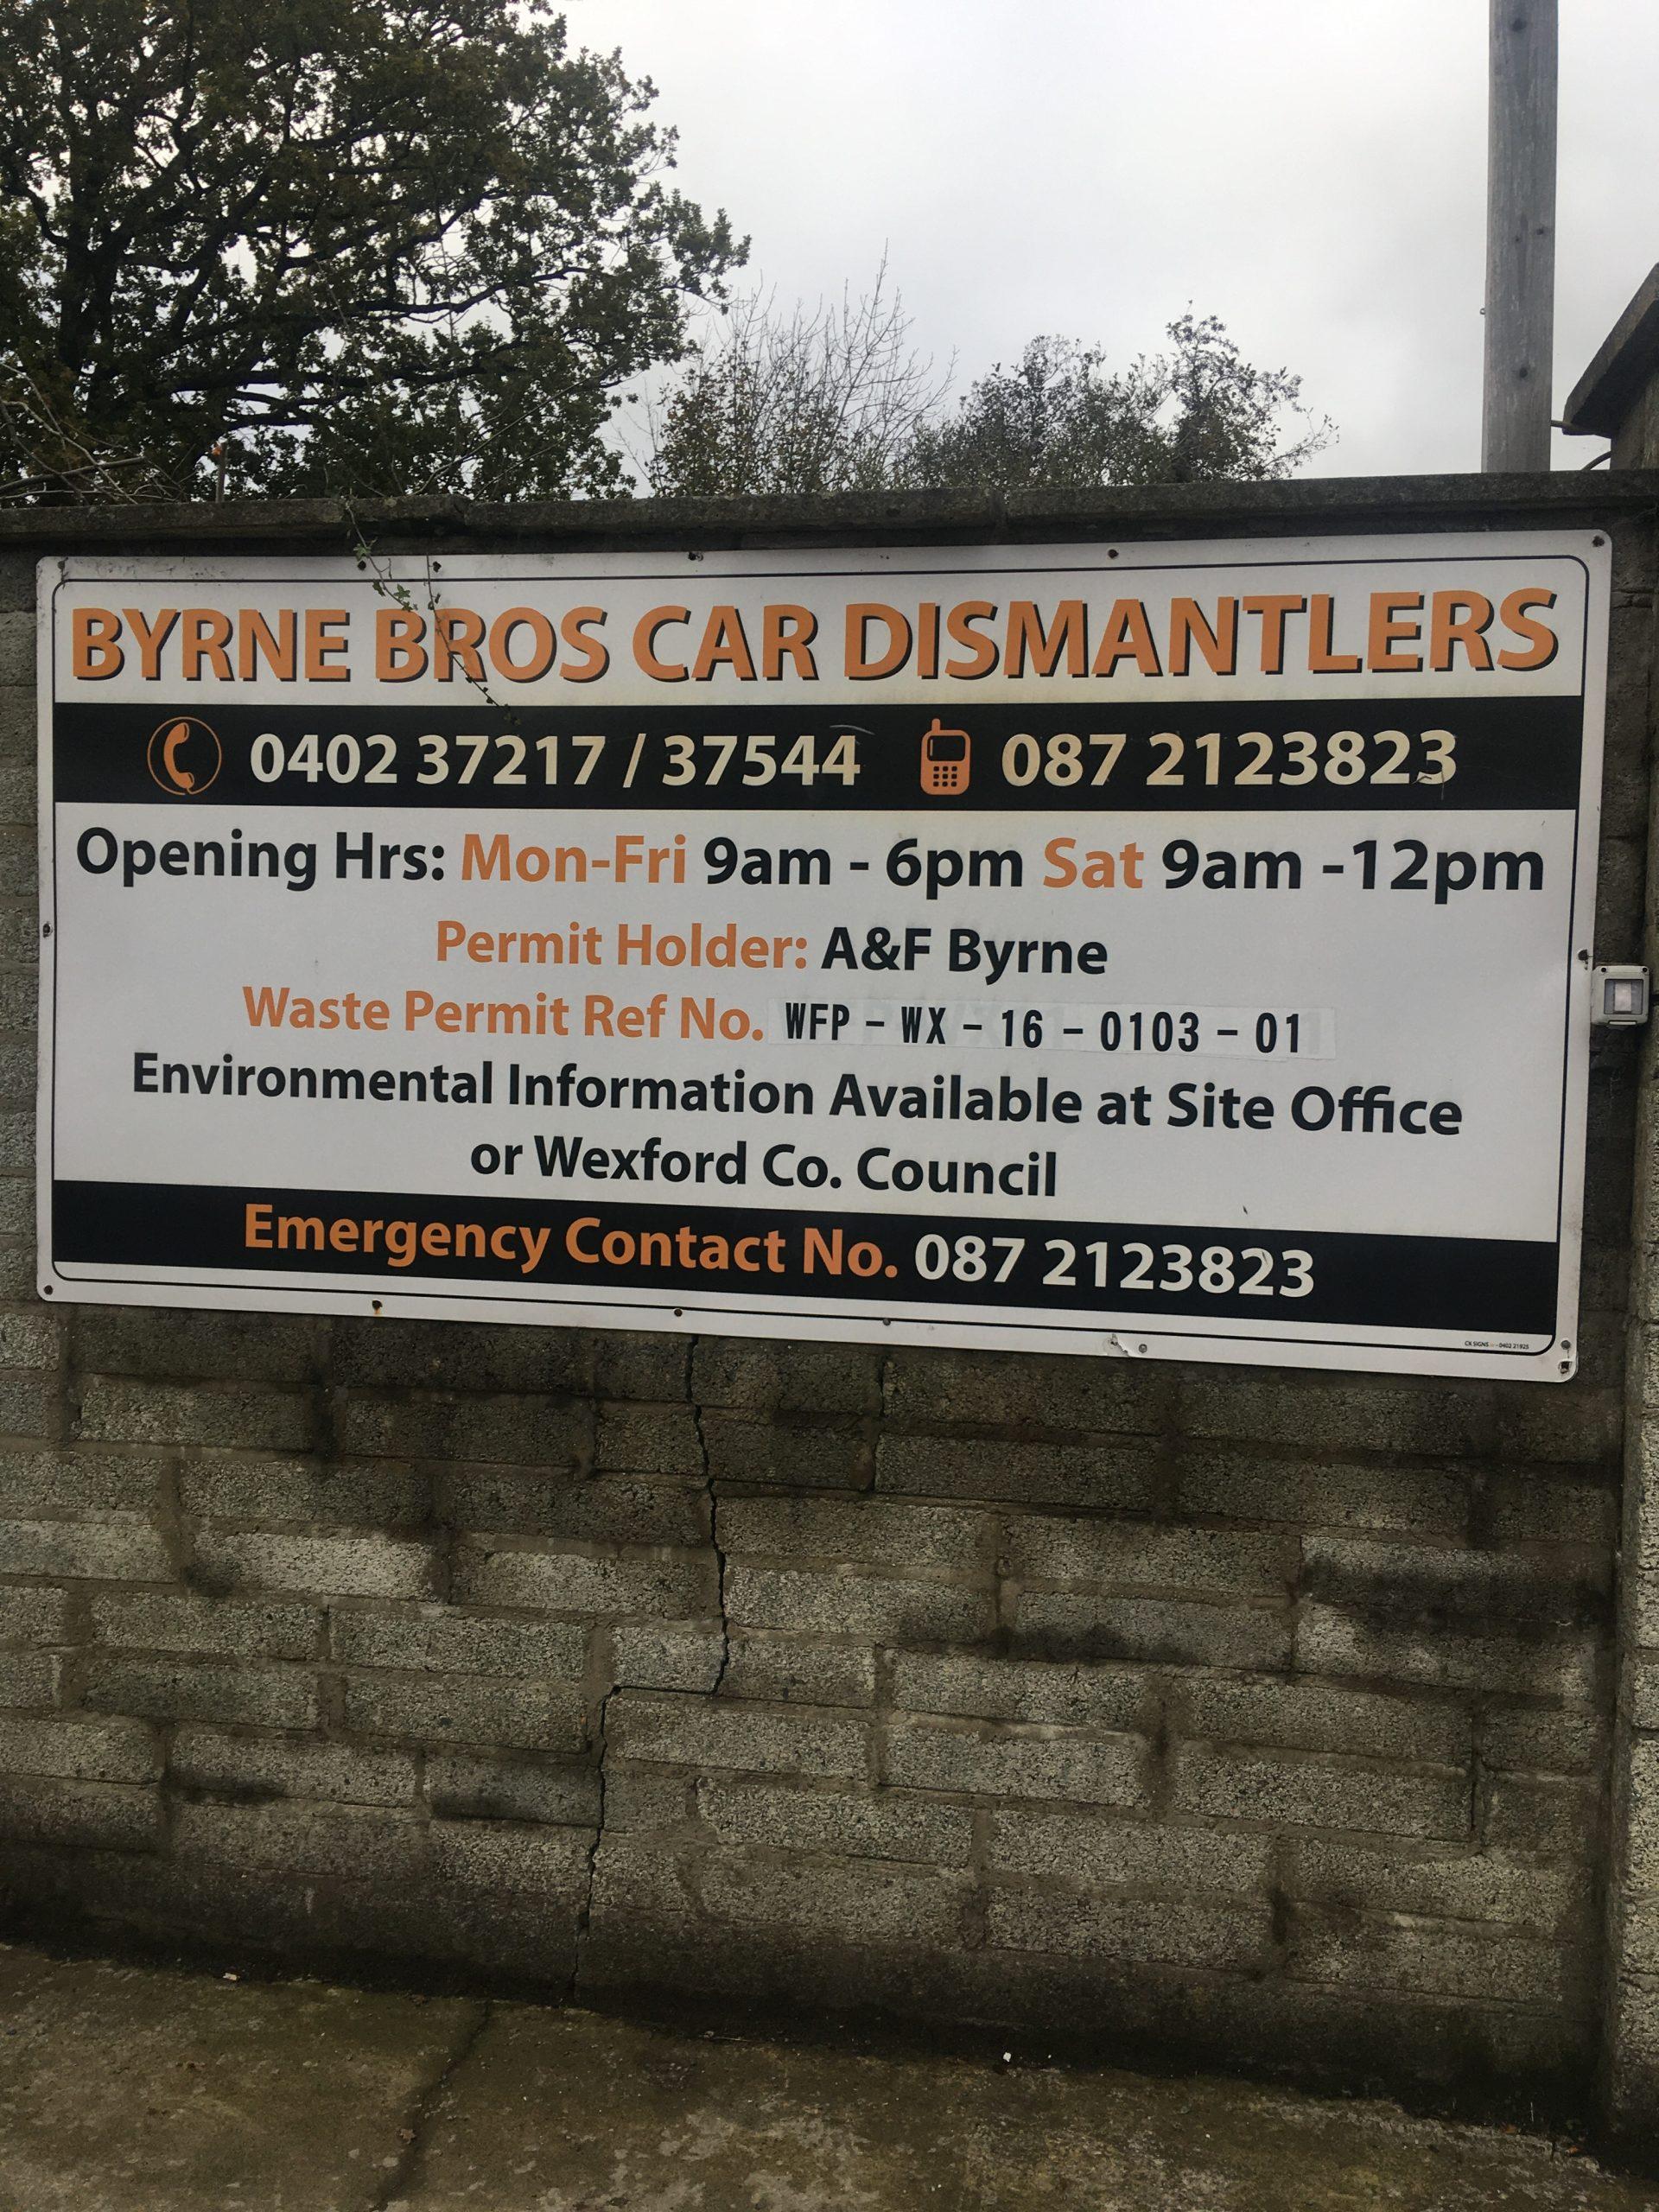 Byrne Car Dismantlers Sigh